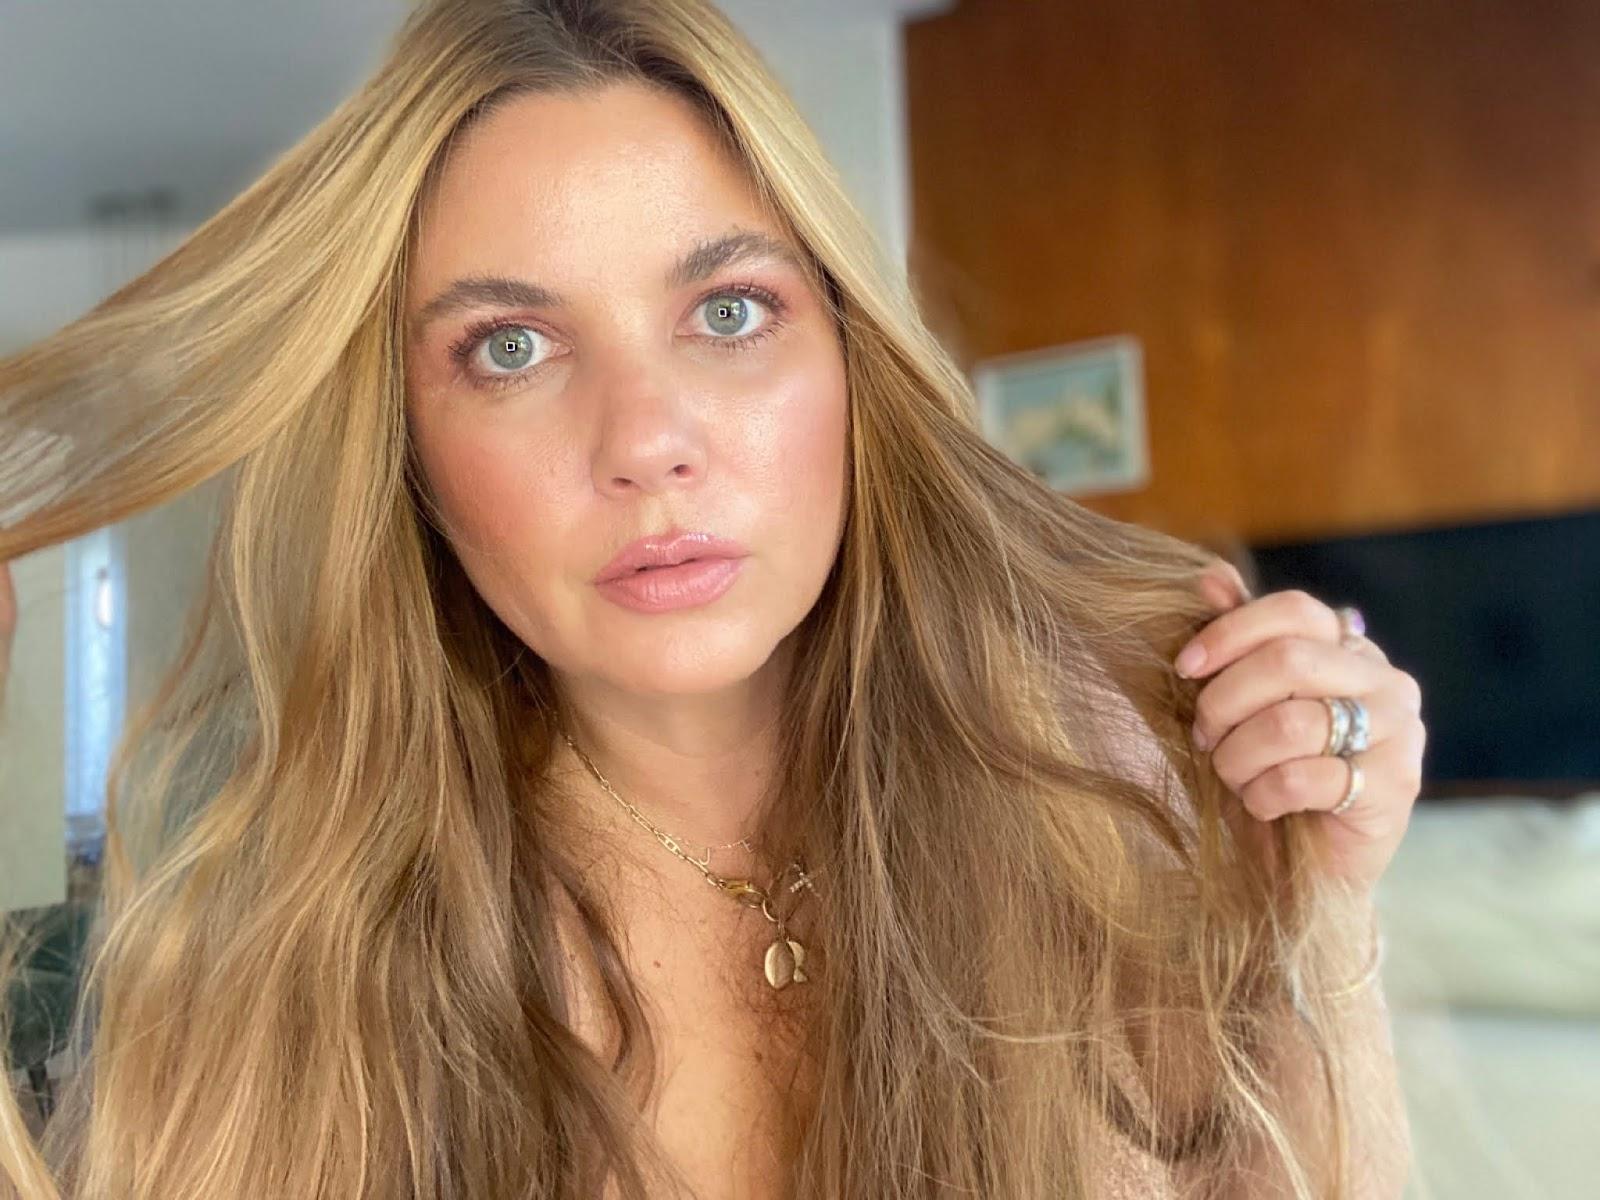 woman showing makeup